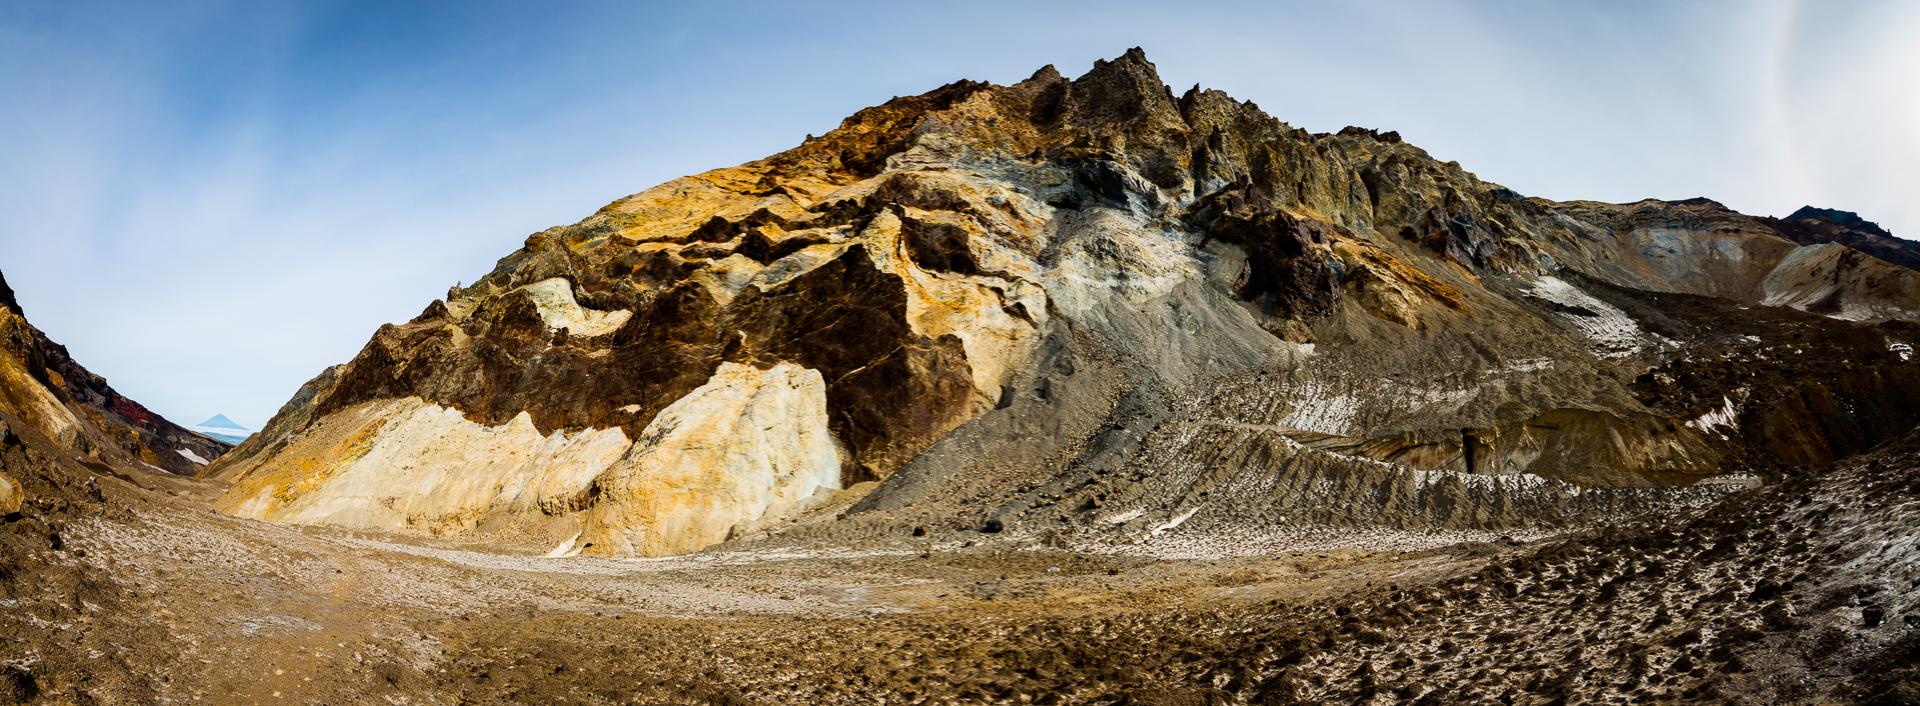 Mutnovskaja kráter